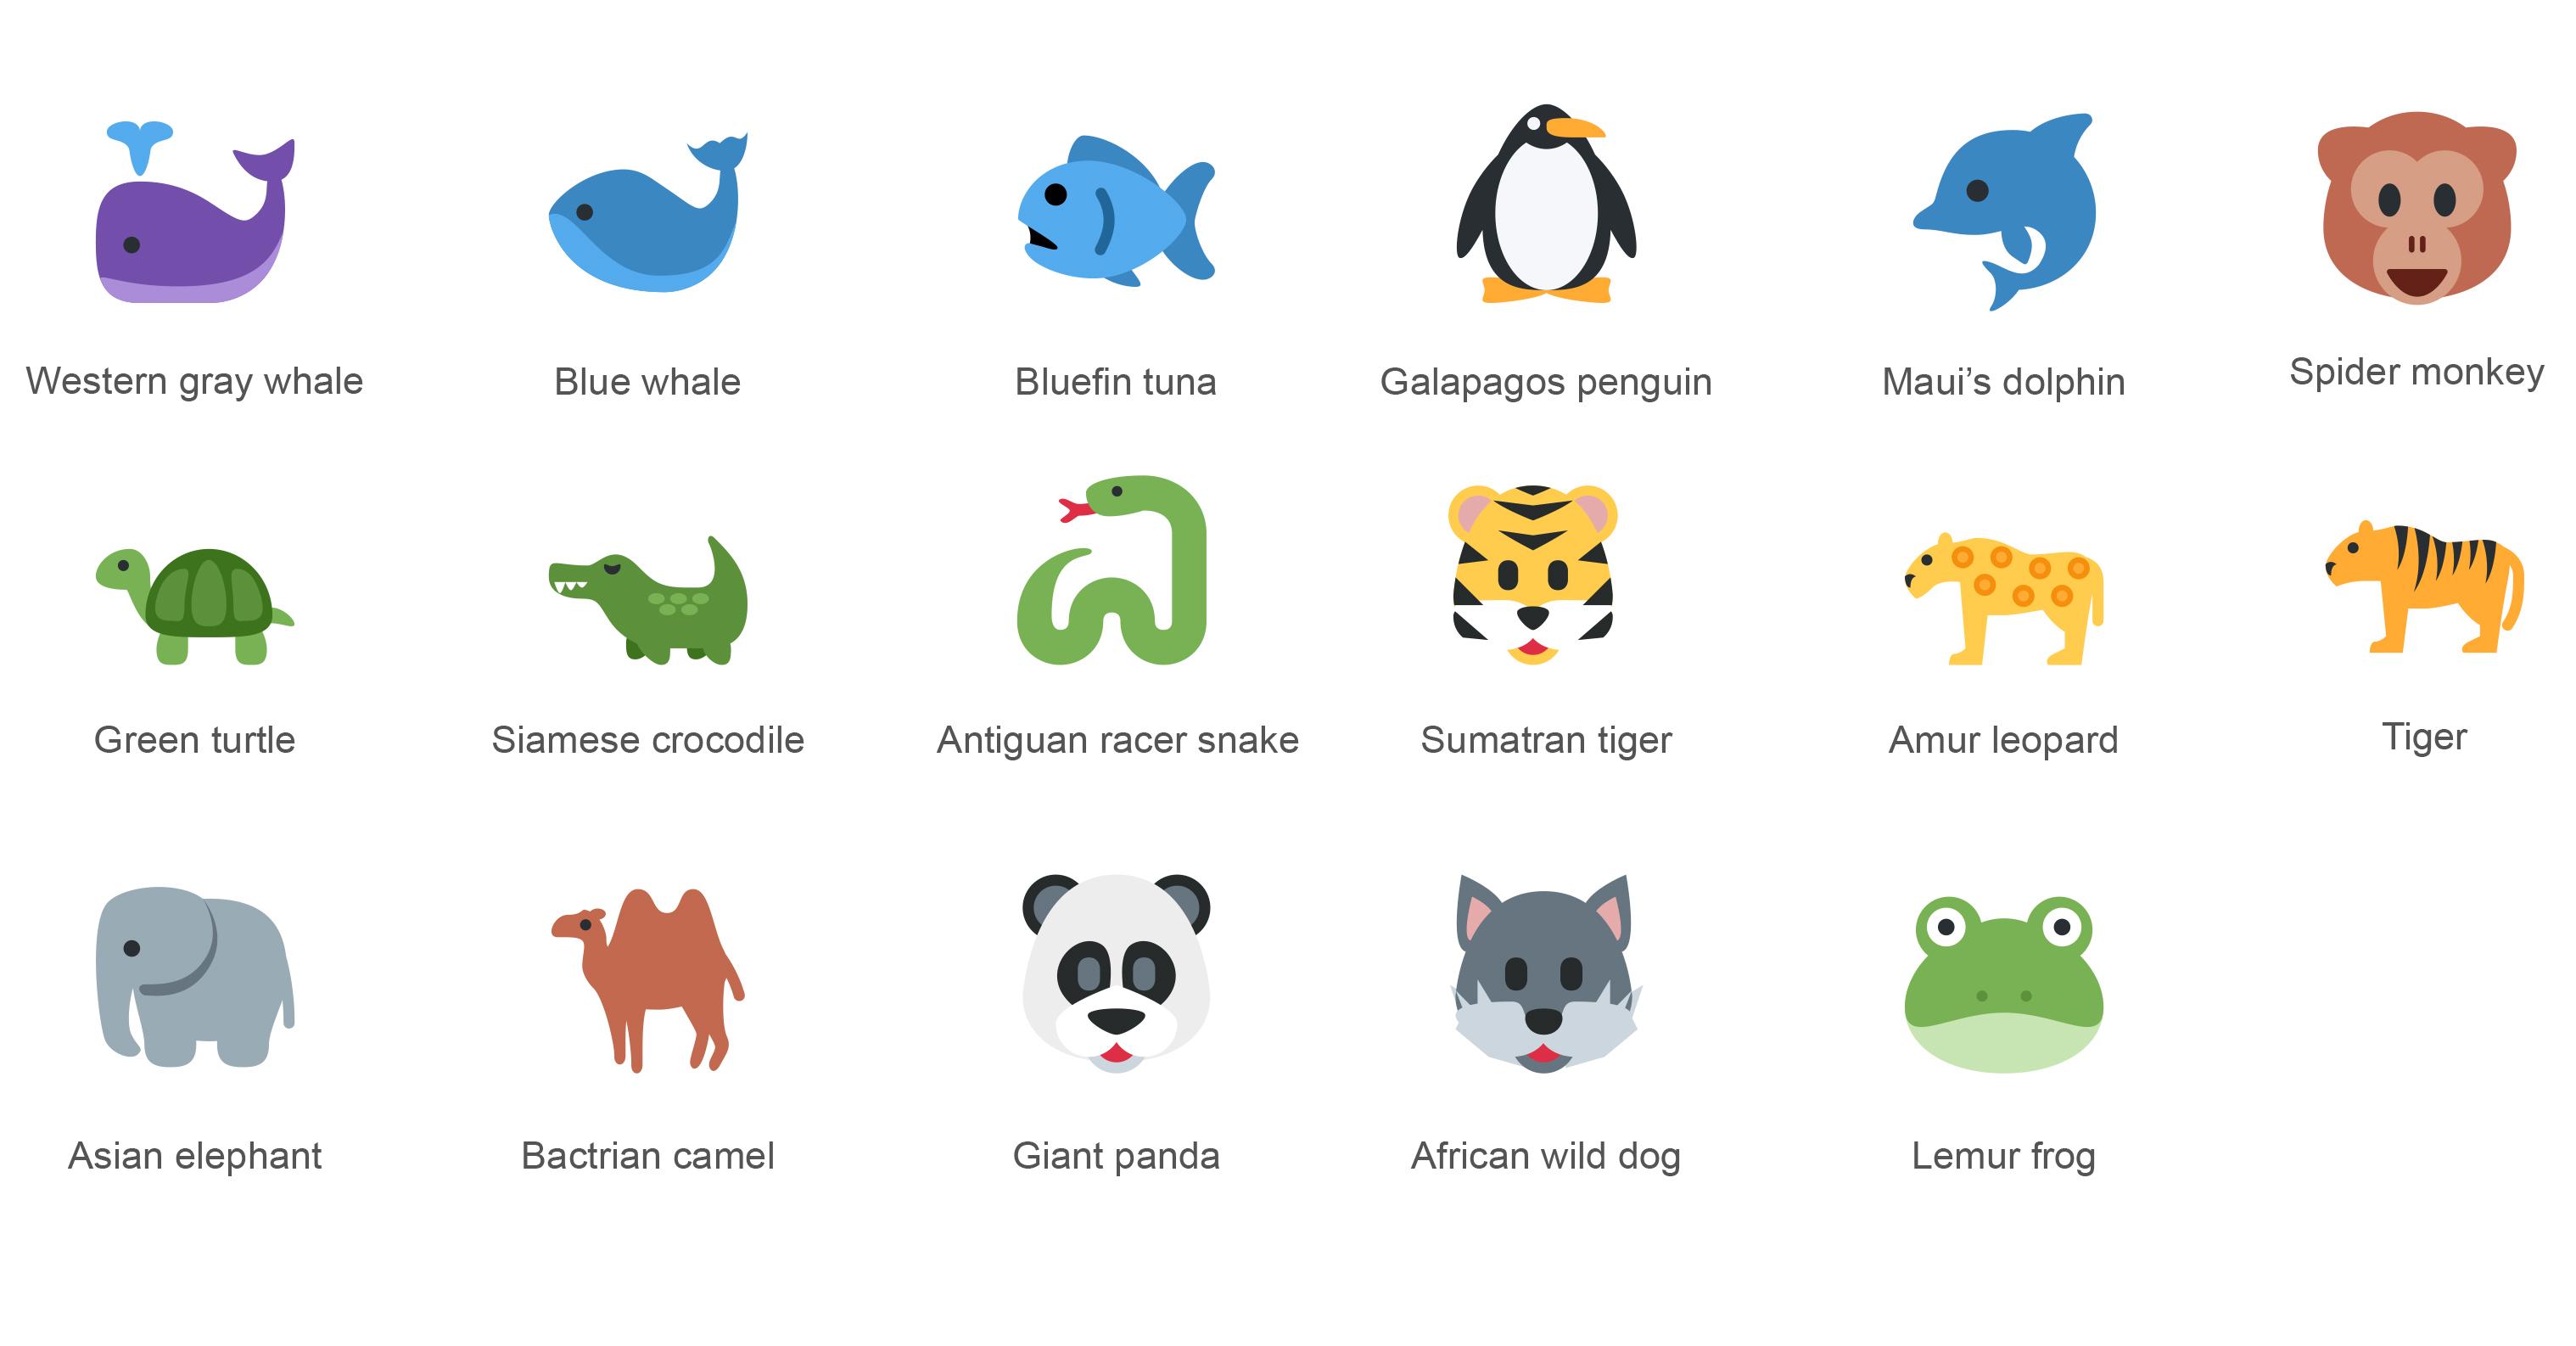 wwf_endangered_emoji_species